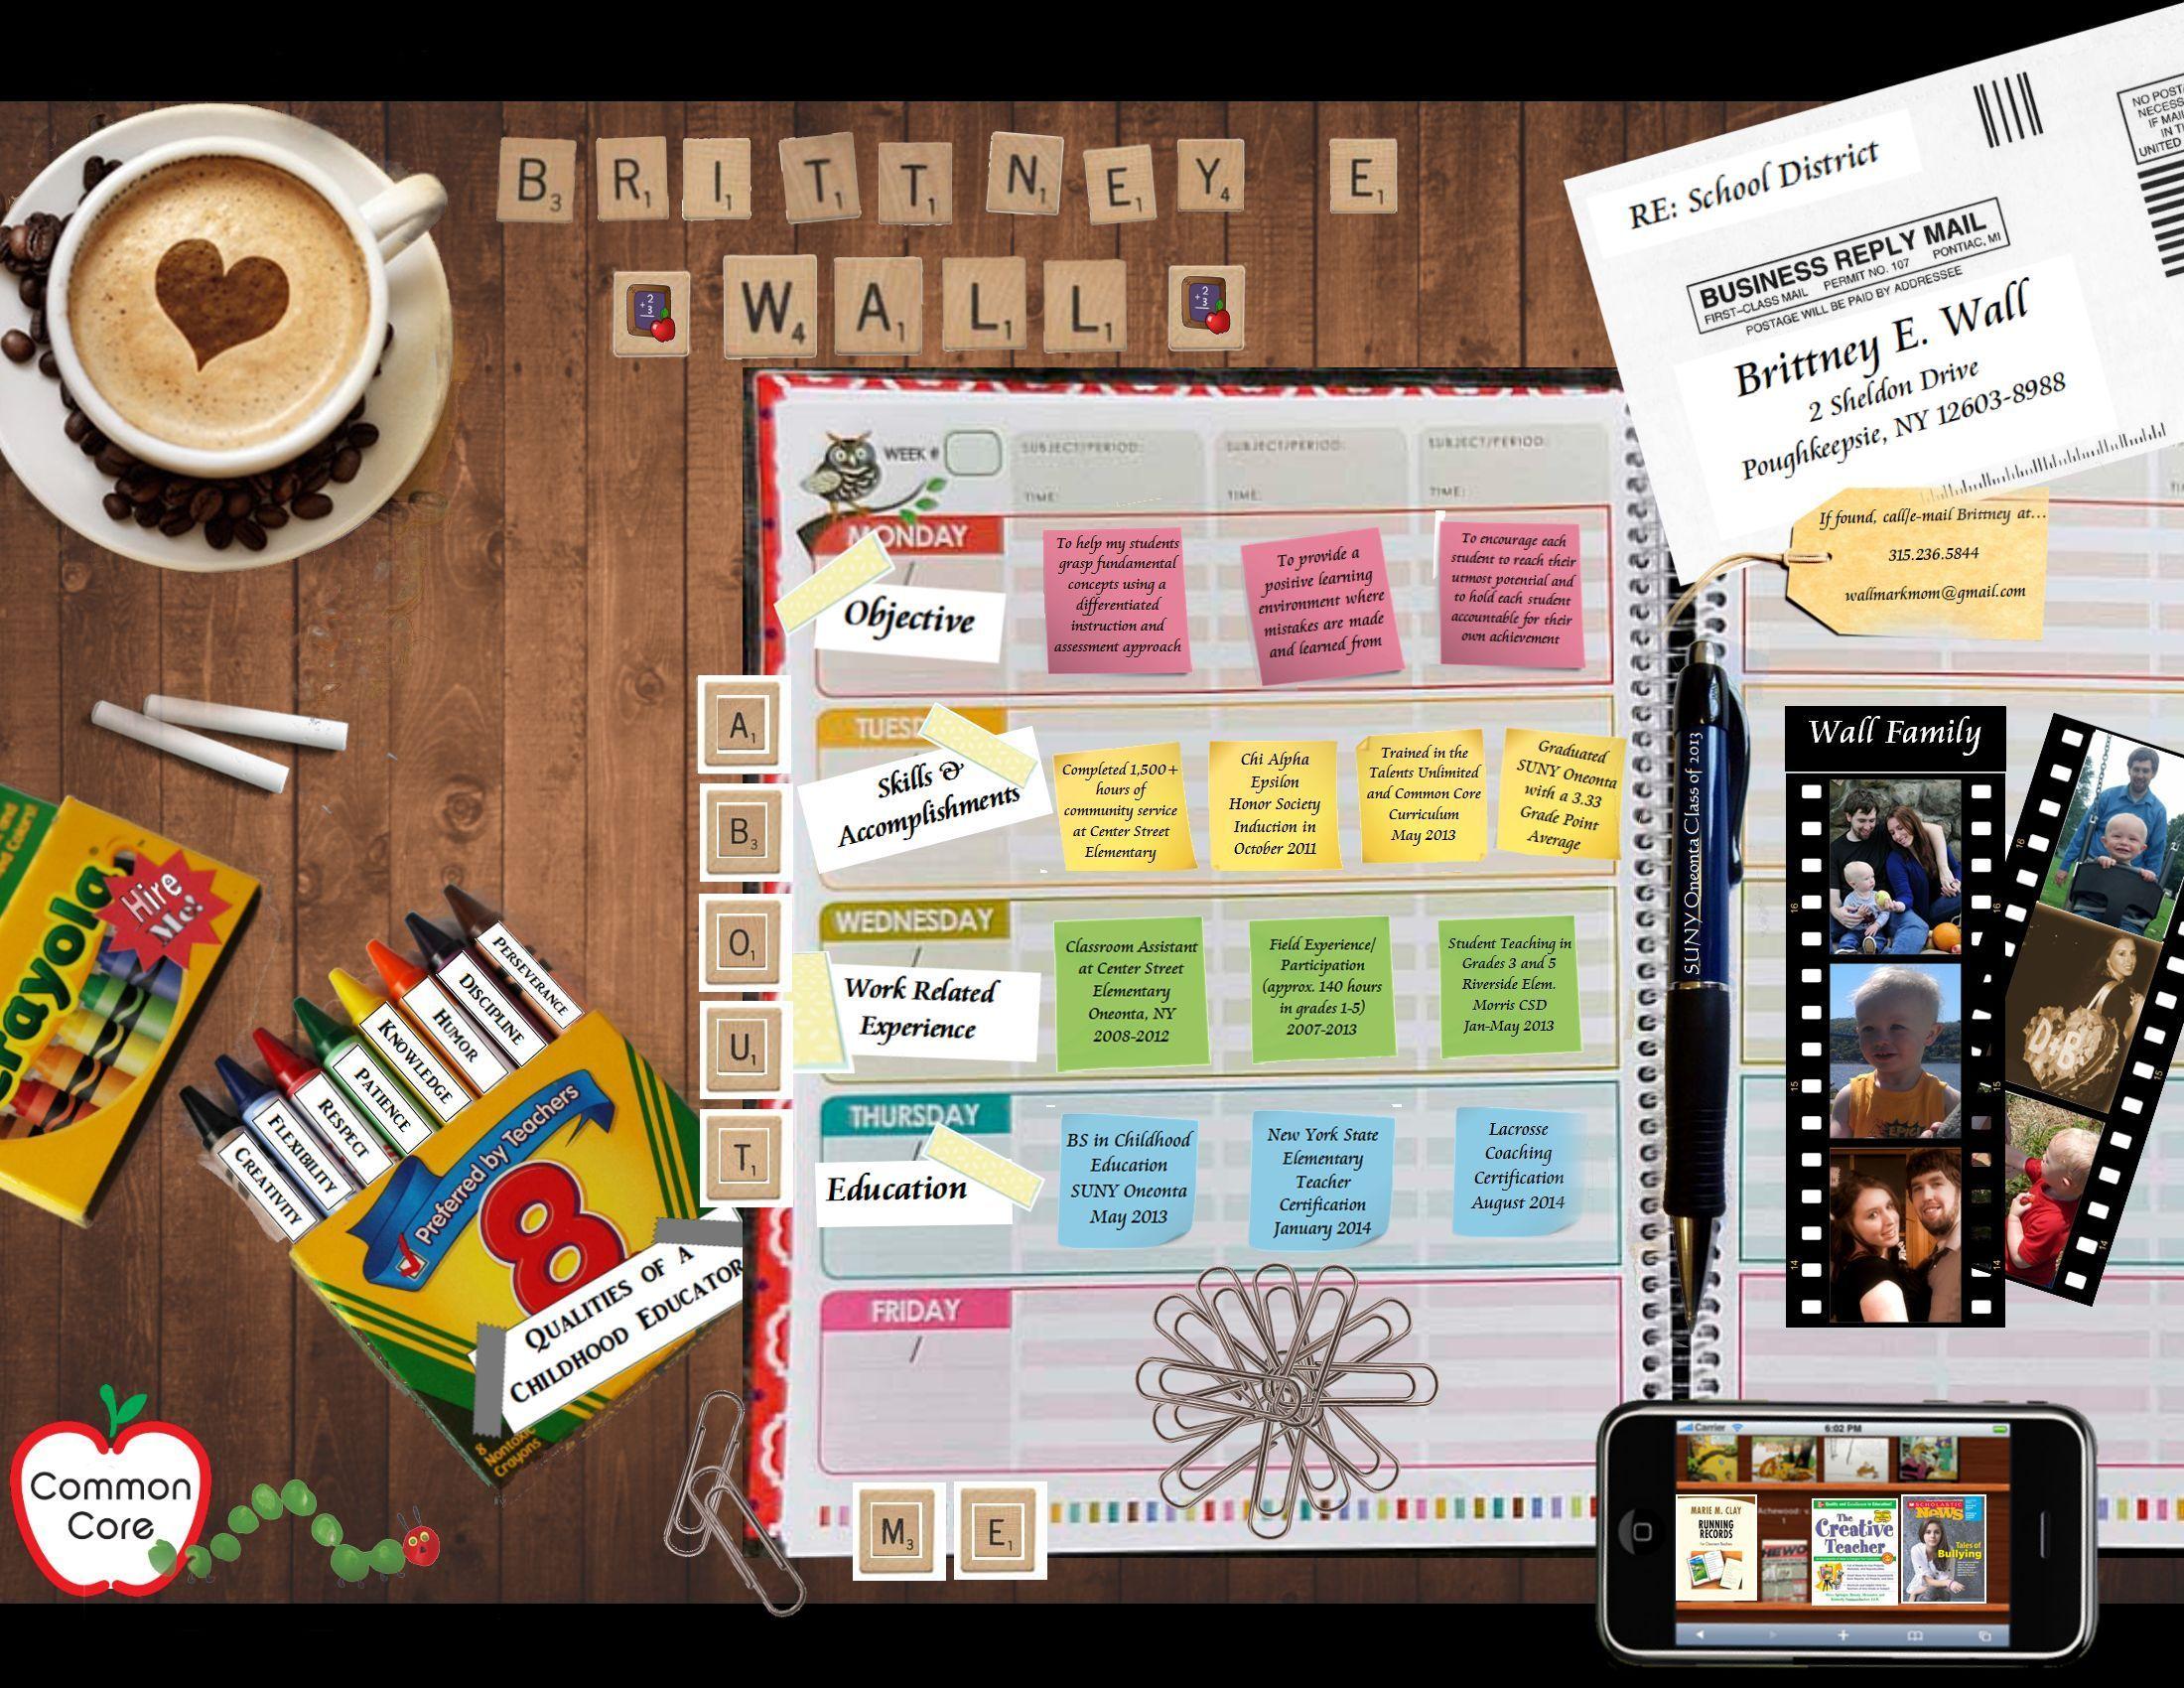 Creative Resume For An Elementary School Teacher Position